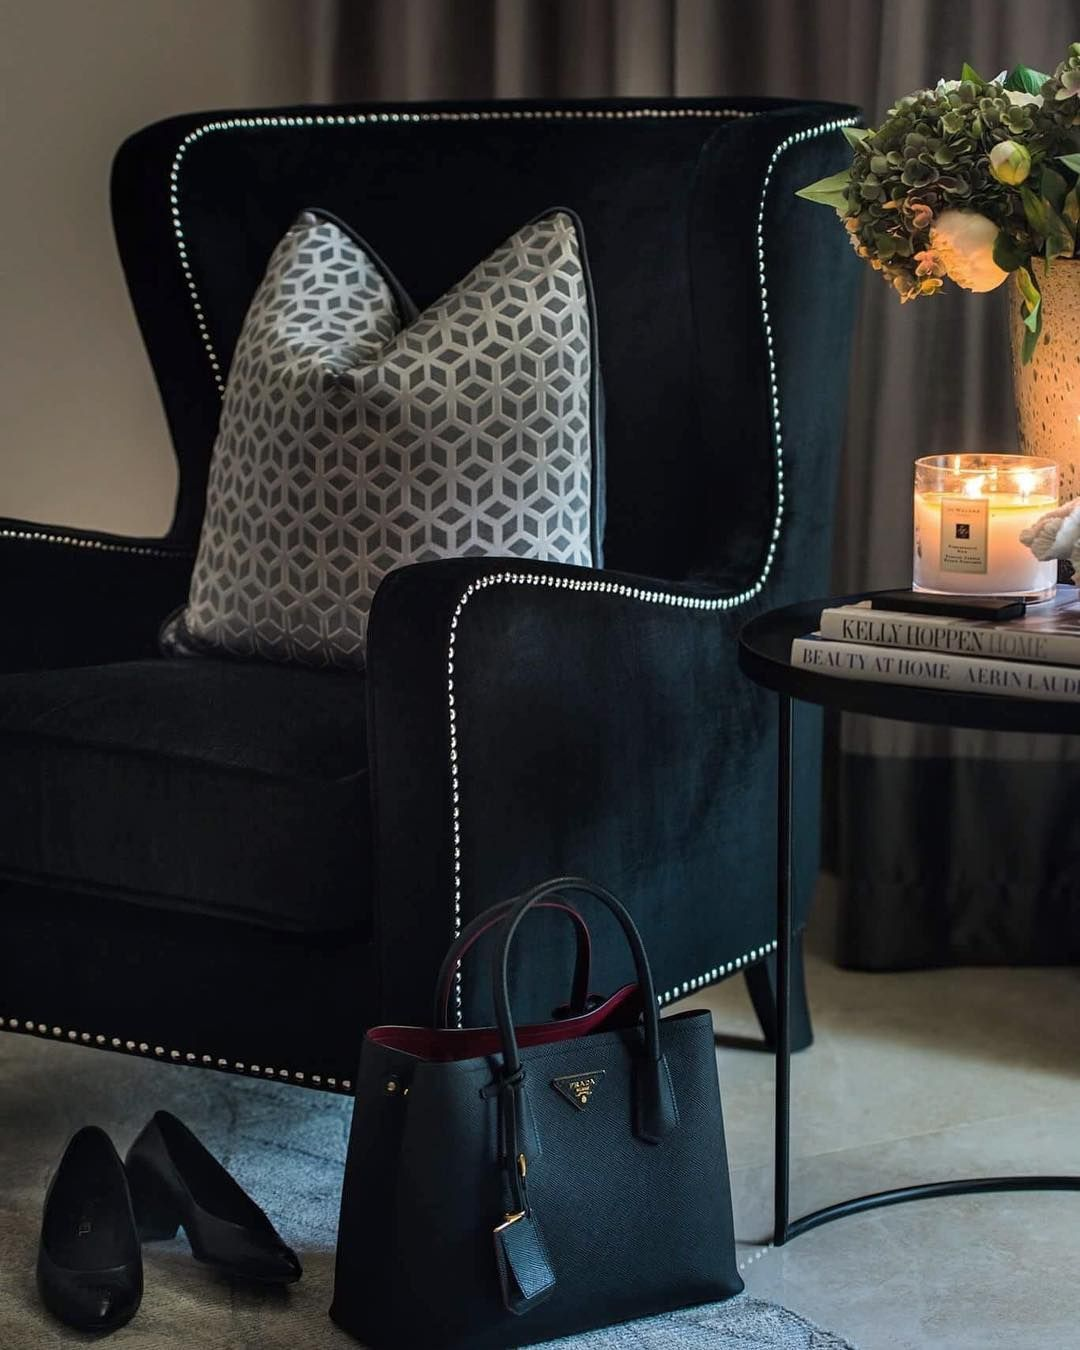 Mrs A HOME Interiors UAE (@mrsahomeinteriors) On Instagram